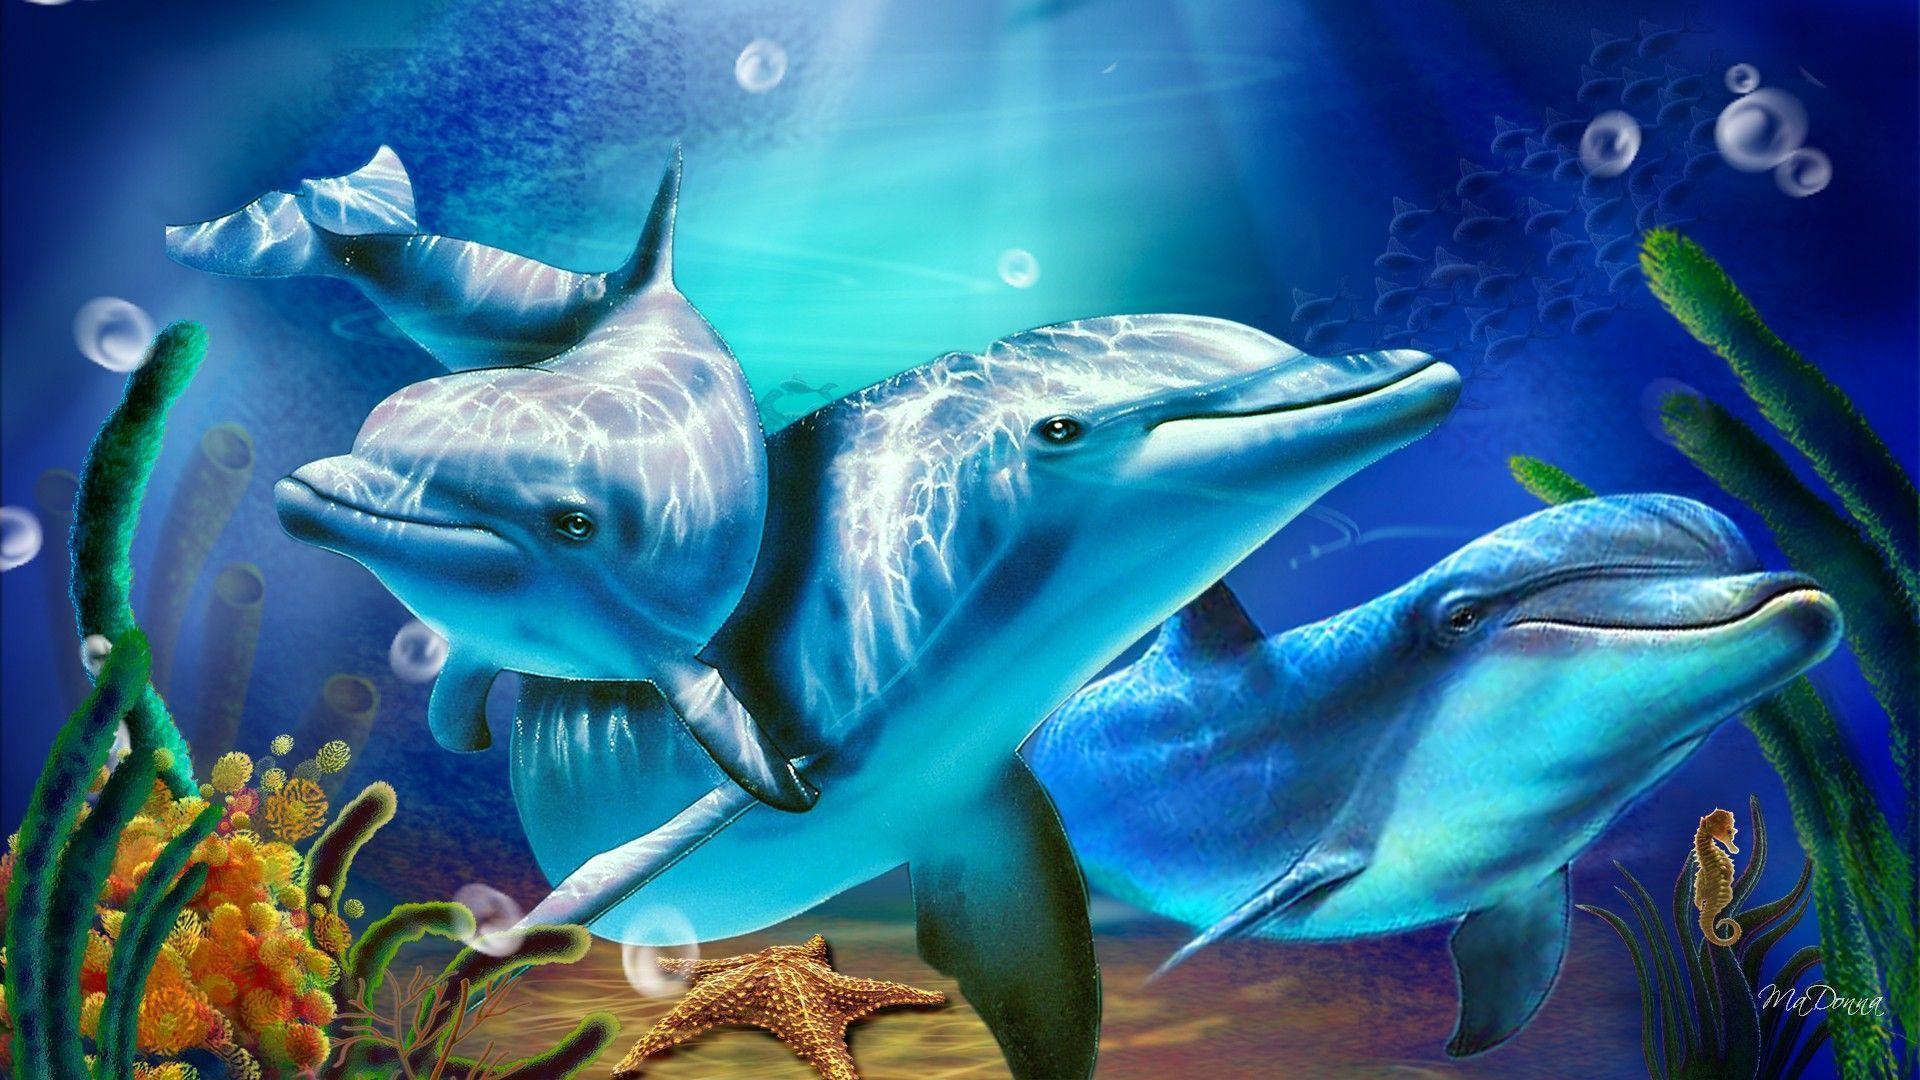 3D Living Dolphin HD Wallpapers - HD Wallpapers Inn